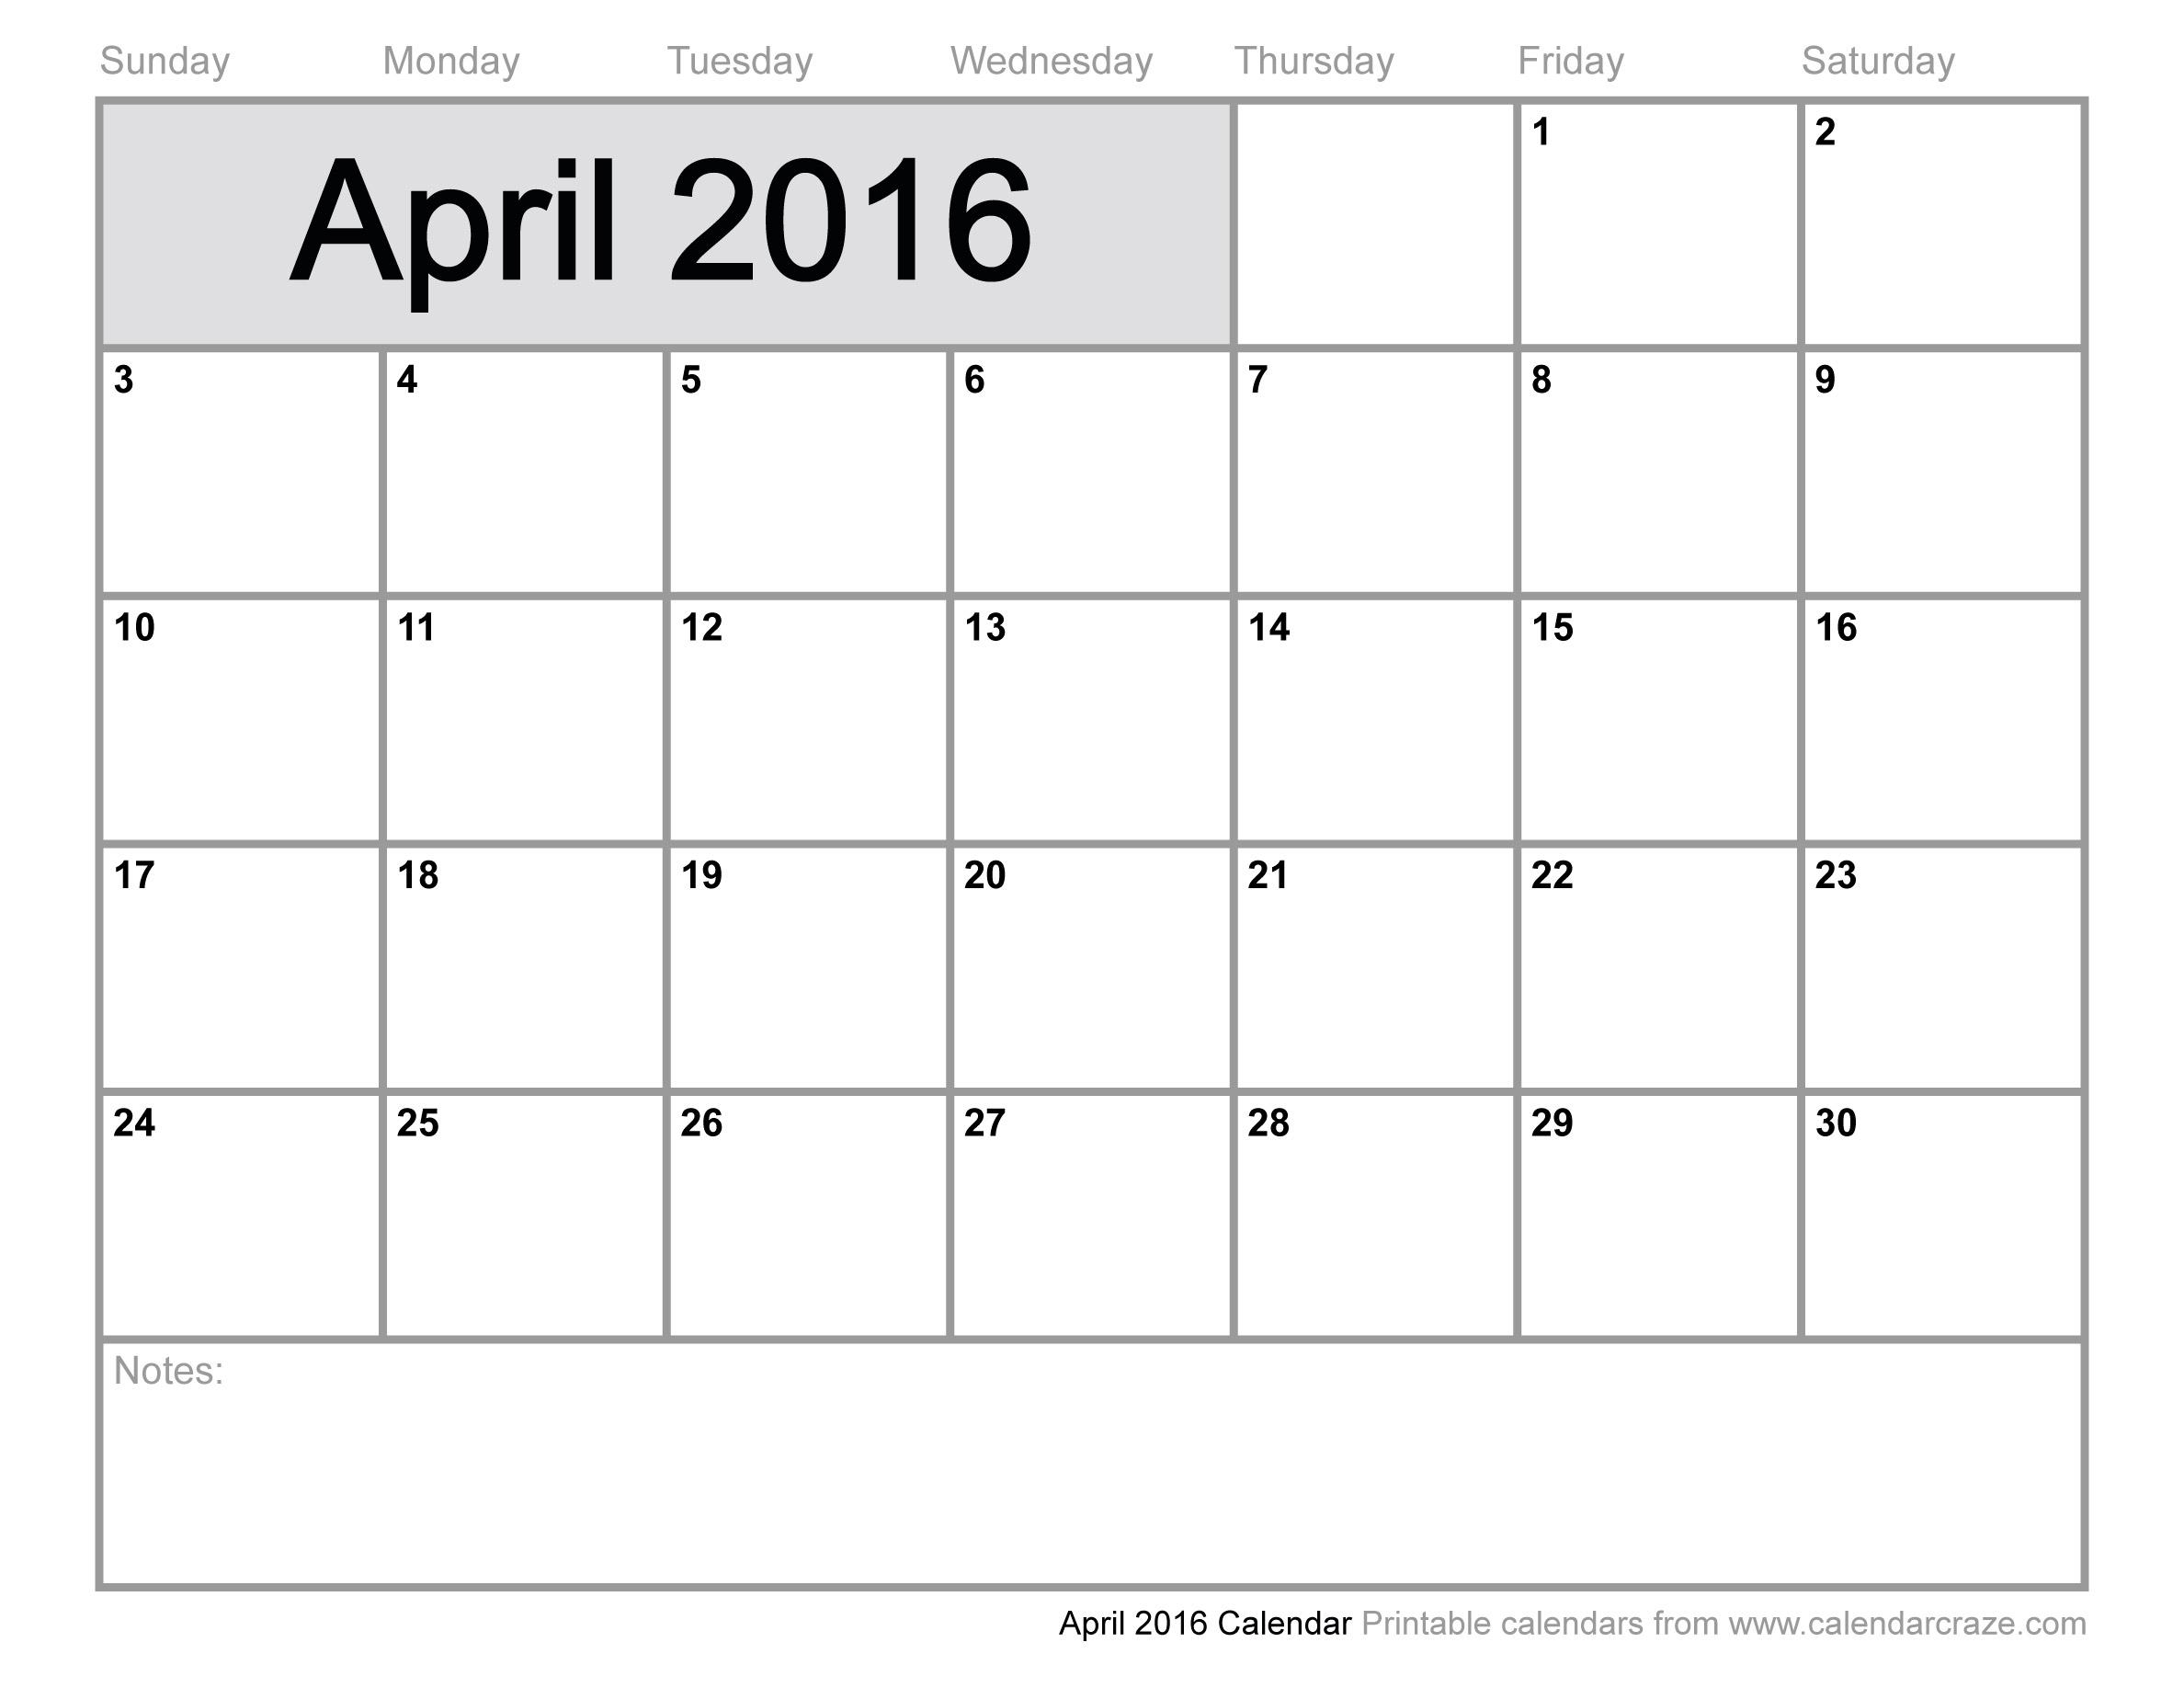 April 2016 calendar clipart picture black and white stock Calendar clipart april 4th - ClipartFest picture black and white stock